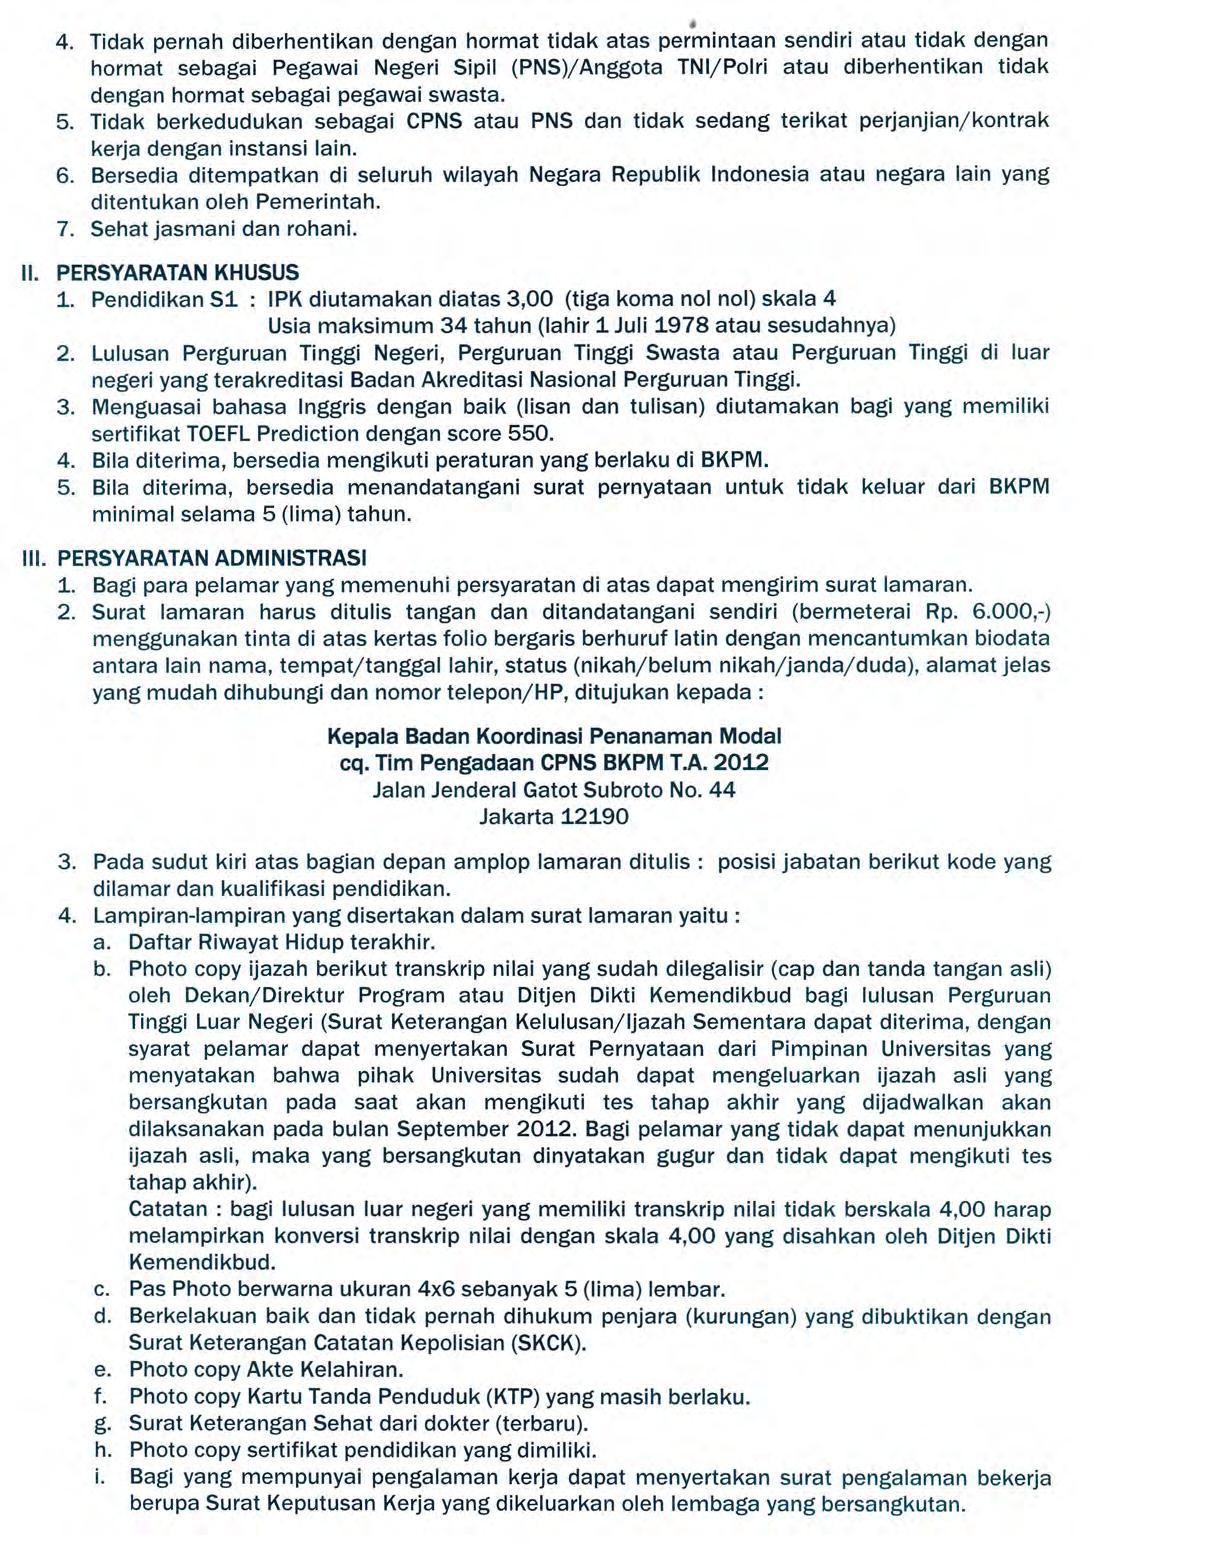 Lowongan Cpns Depkes 2013 Cpns 2016 Cpnsindonesiacom Untuk Diangkat Menjadi Calon Pegawai Negeri Sipil Cpns Golongan